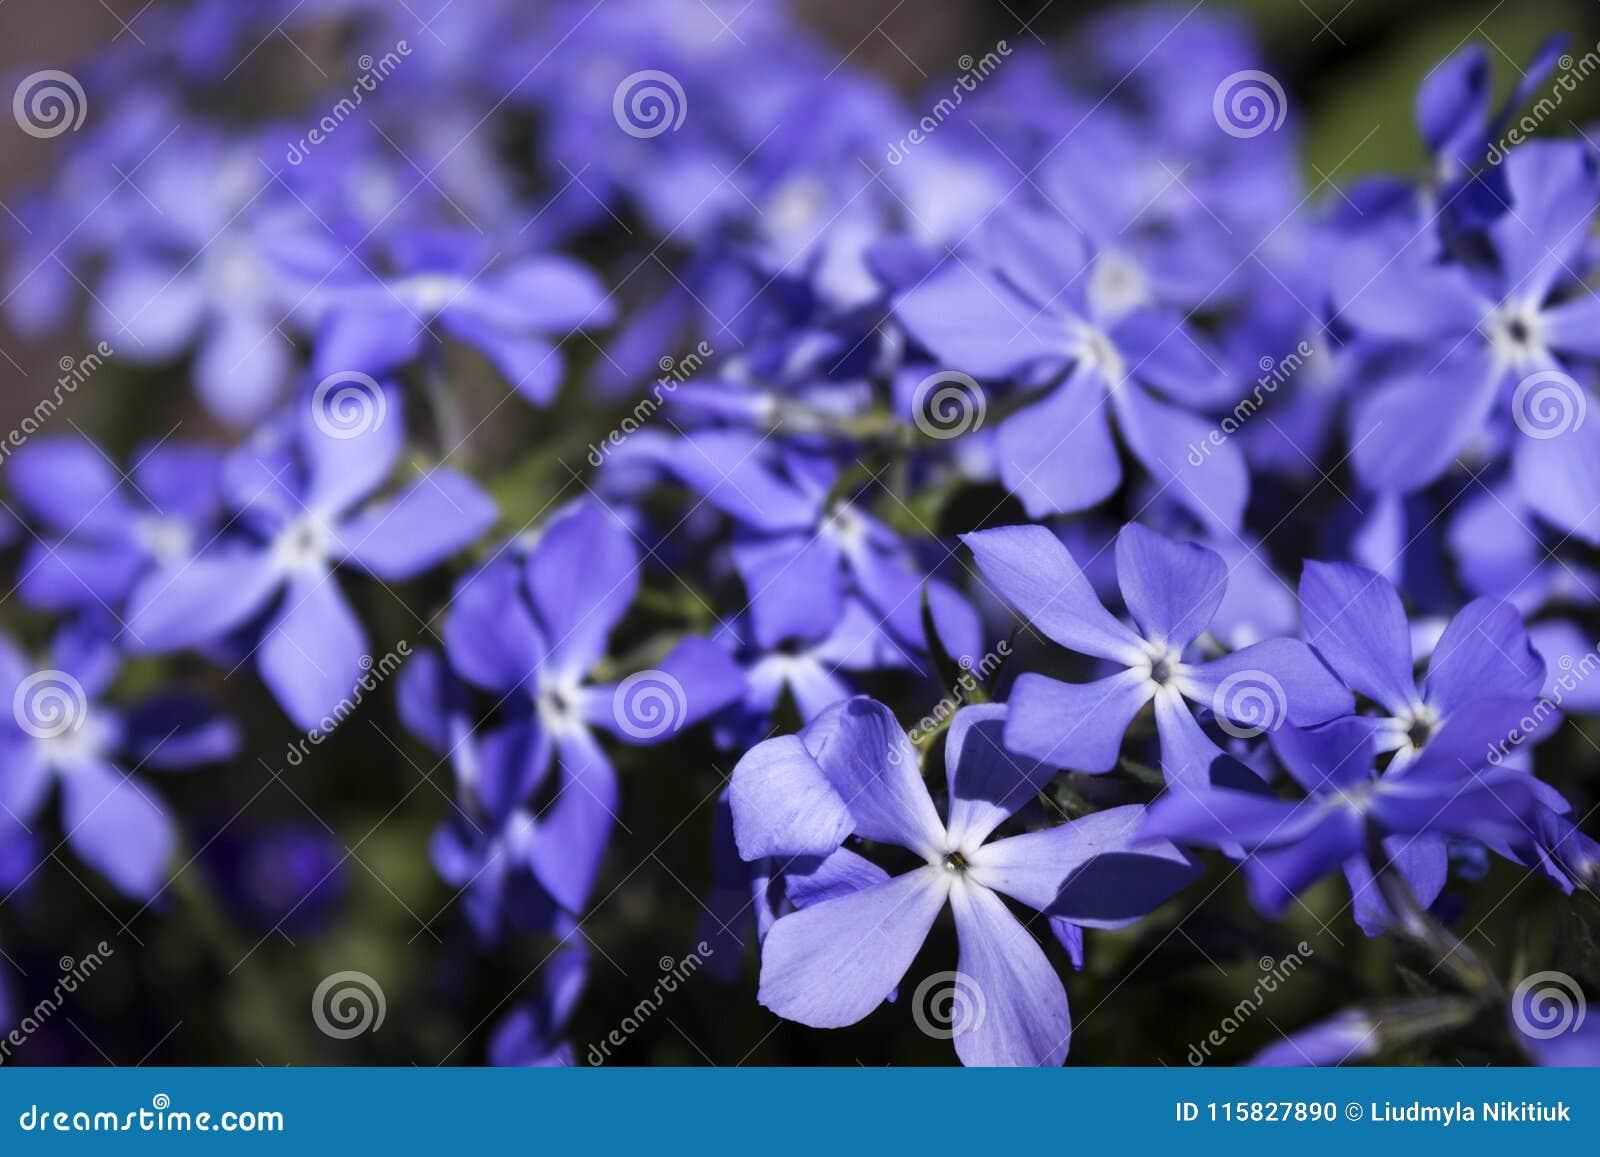 Bright Blue Phlox Many Small Spring Flowers Botany Background